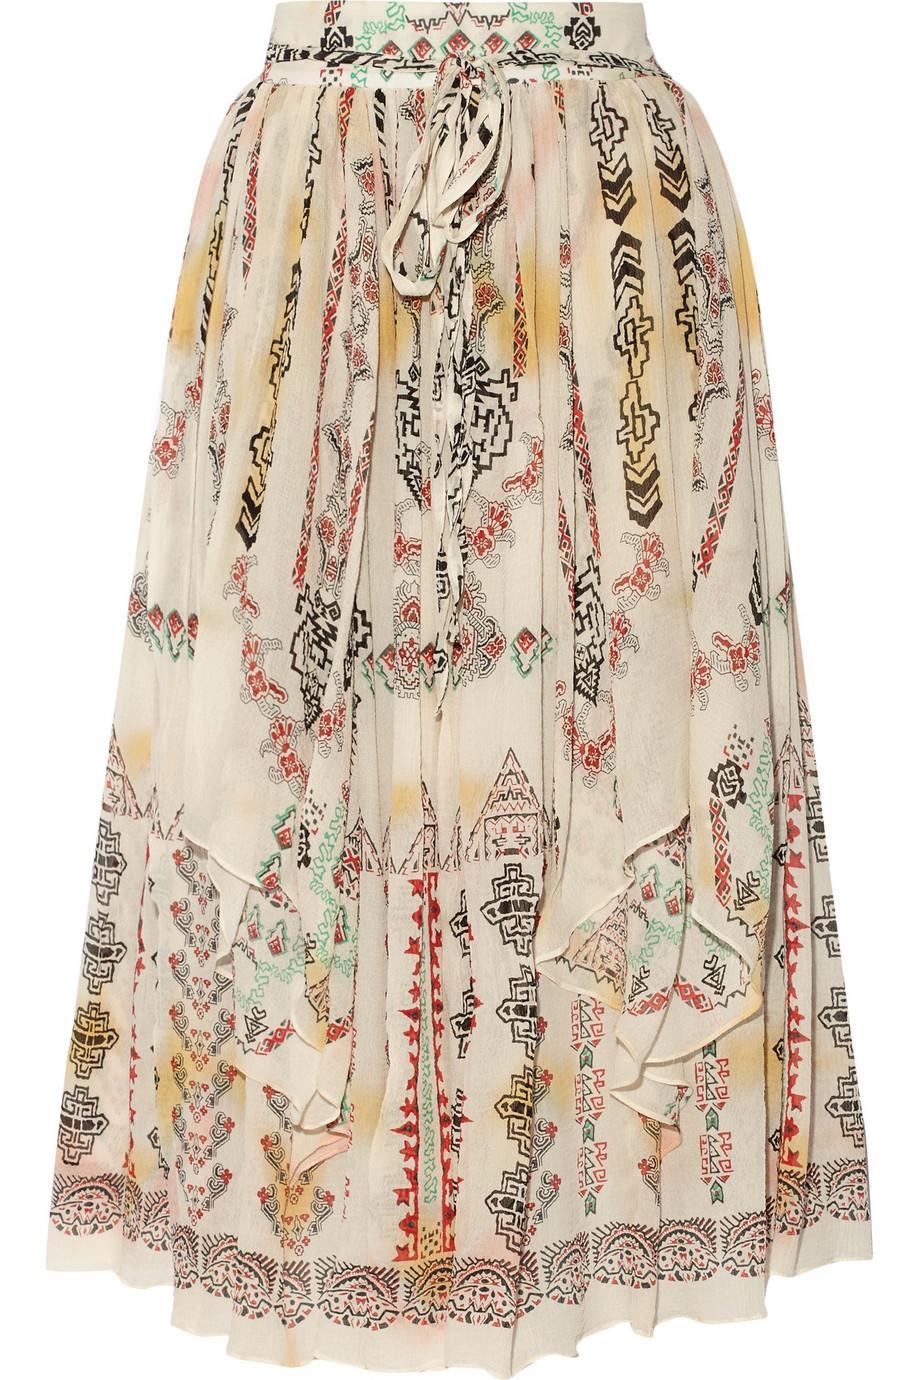 Únete a la tendencia boho-chic con estas prendas de @EtroOfficial . ¿Cuál es tu favorita? http://t.co/zu86hnGdV7